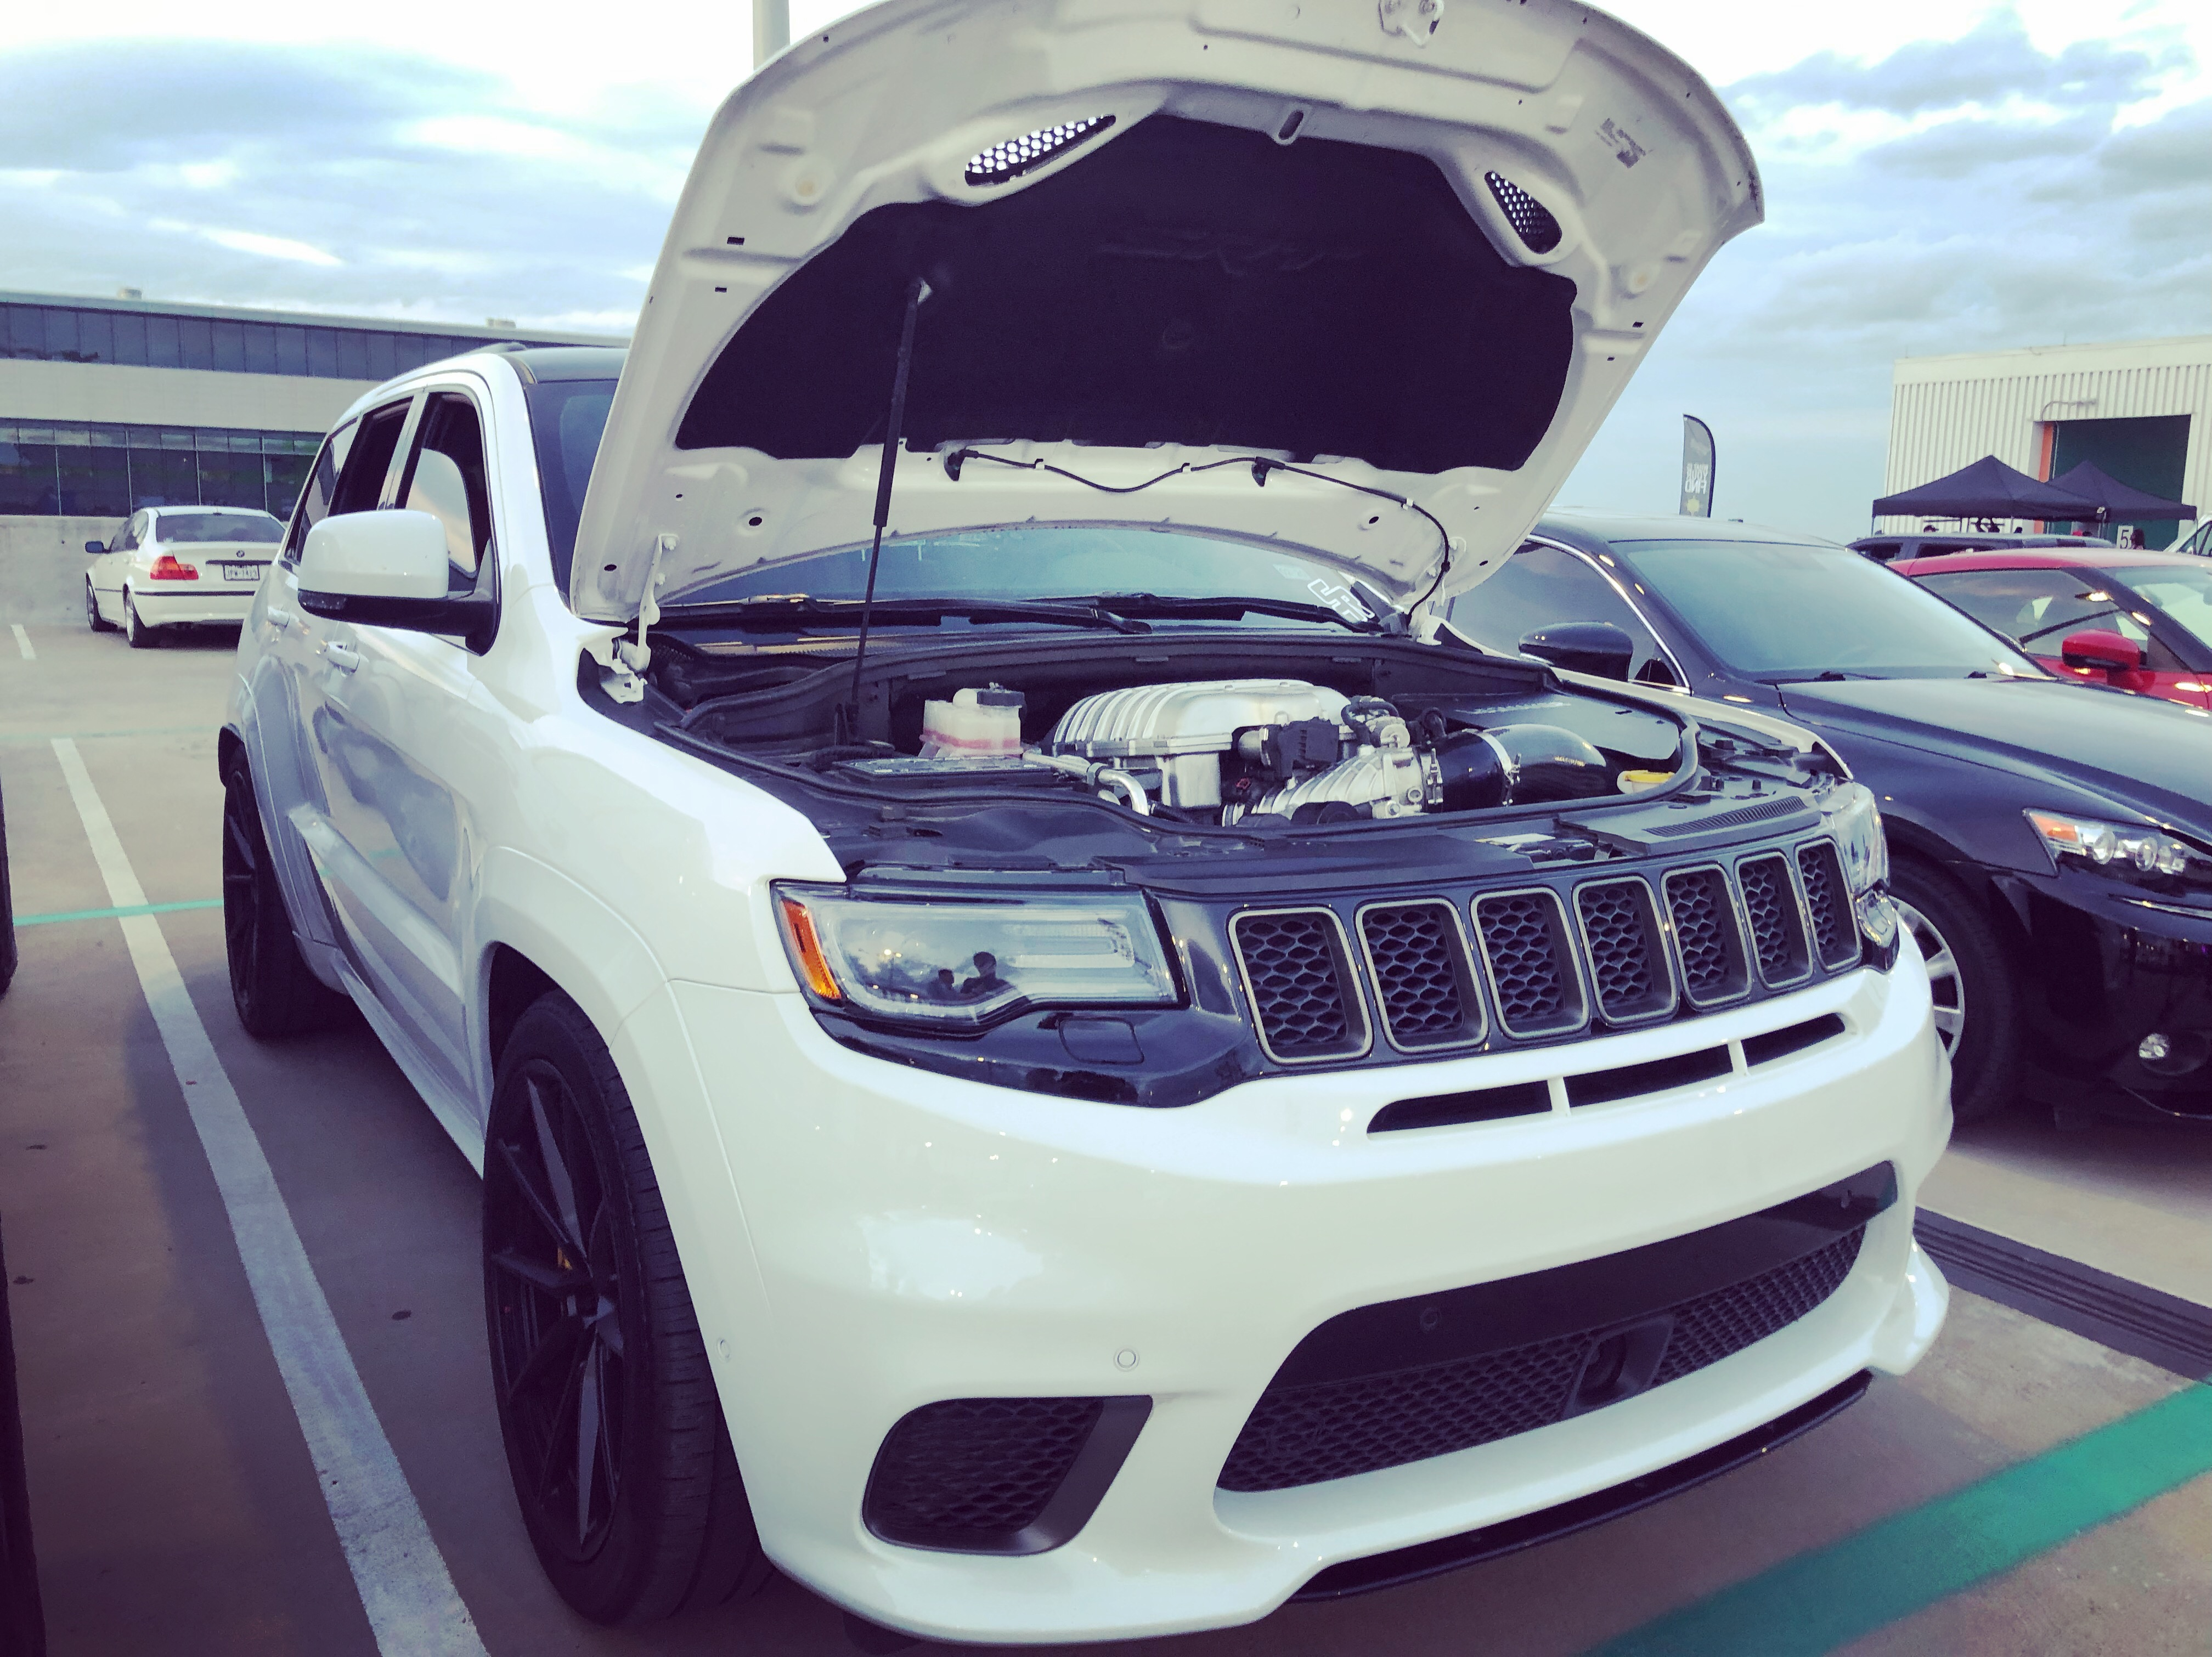 1200 HP Jeep TrackHawk